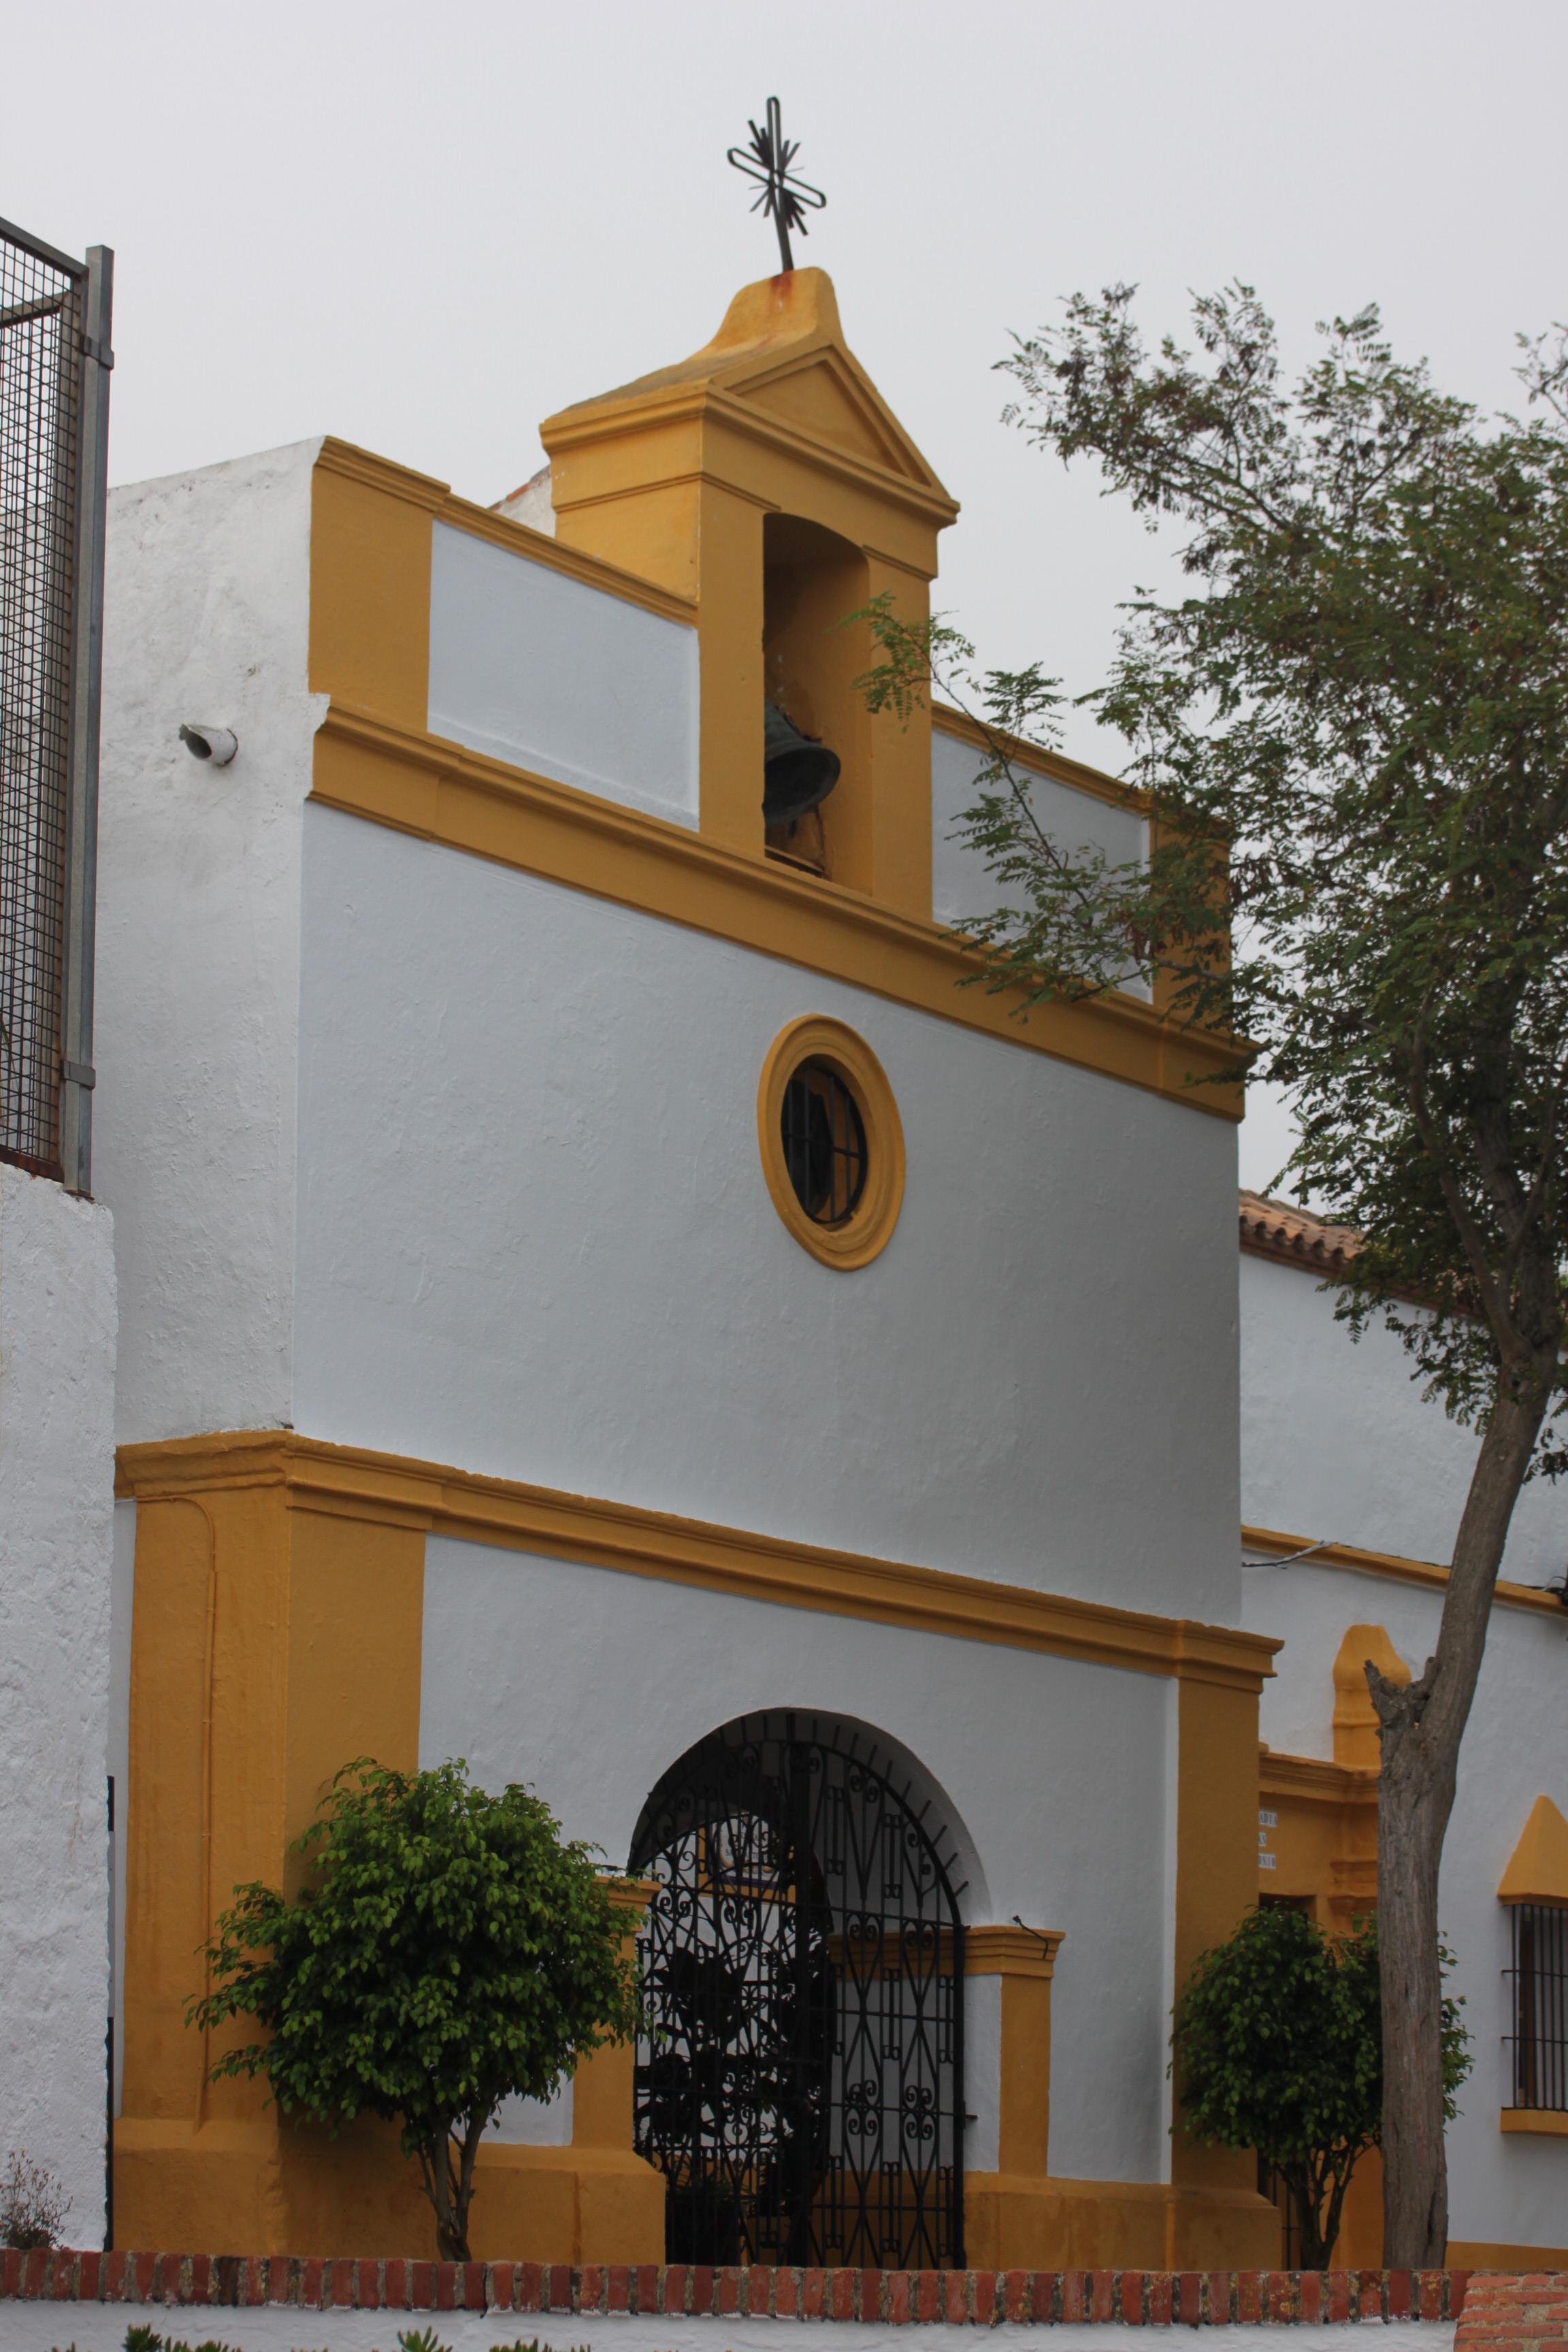 http://upload.wikimedia.org/wikipedia/commons/5/59/Ermita_de_San_Antonio_de_Padua_en_el_monte_Hacho_de_Ceuta.jpg